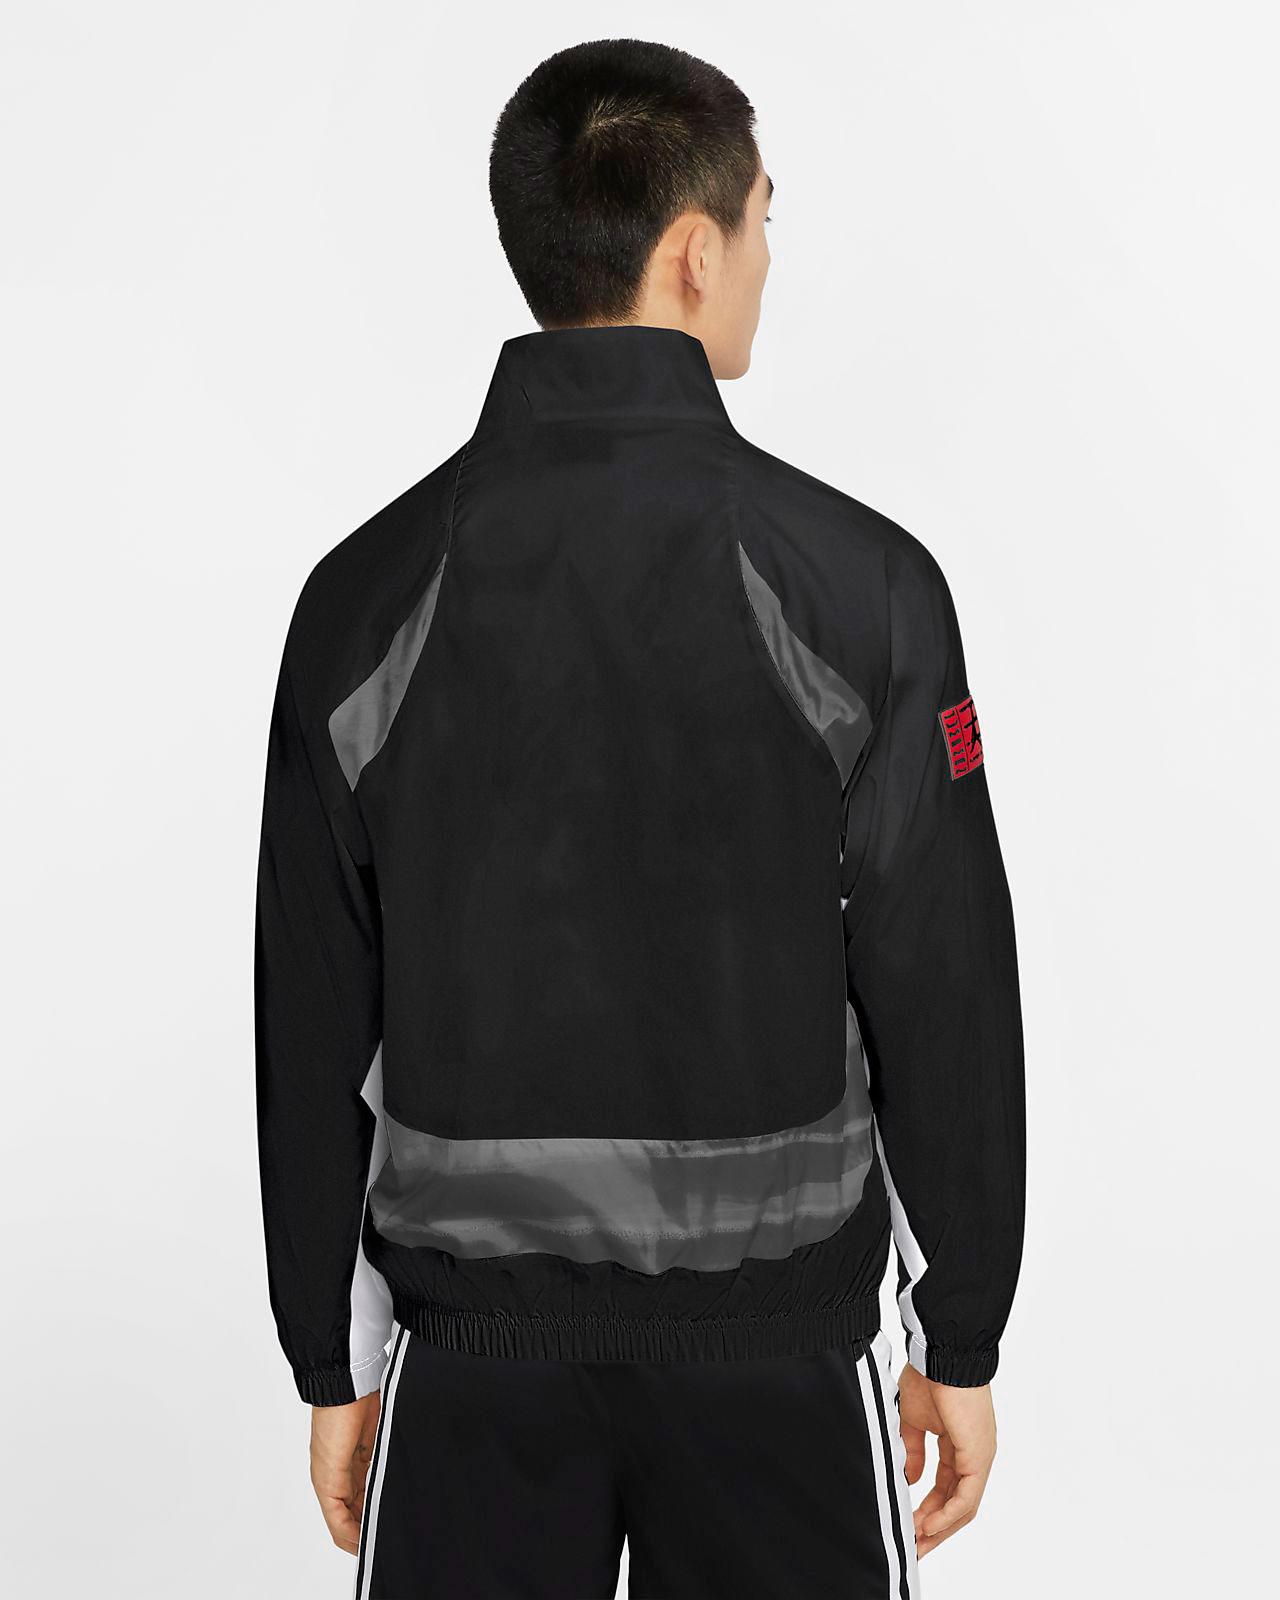 air-jordan-11-concord-bred-jacket-black-2